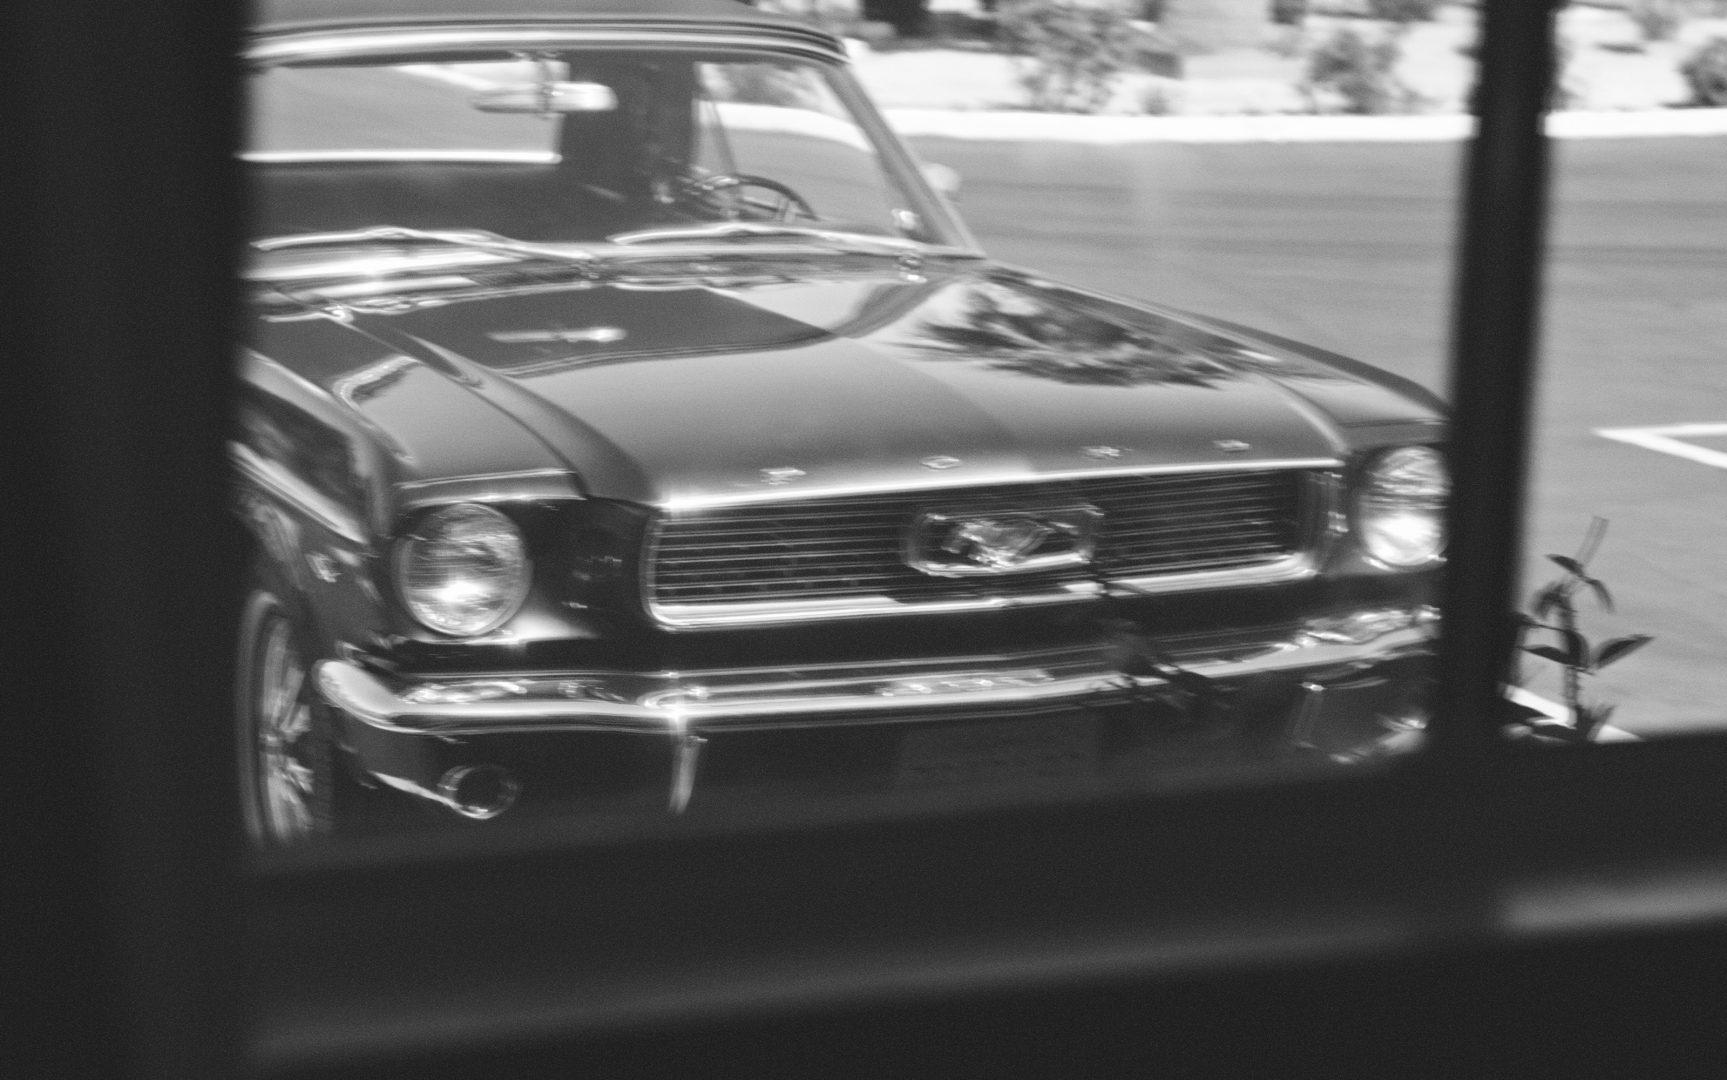 Ford Mustang by Stefan Rappo